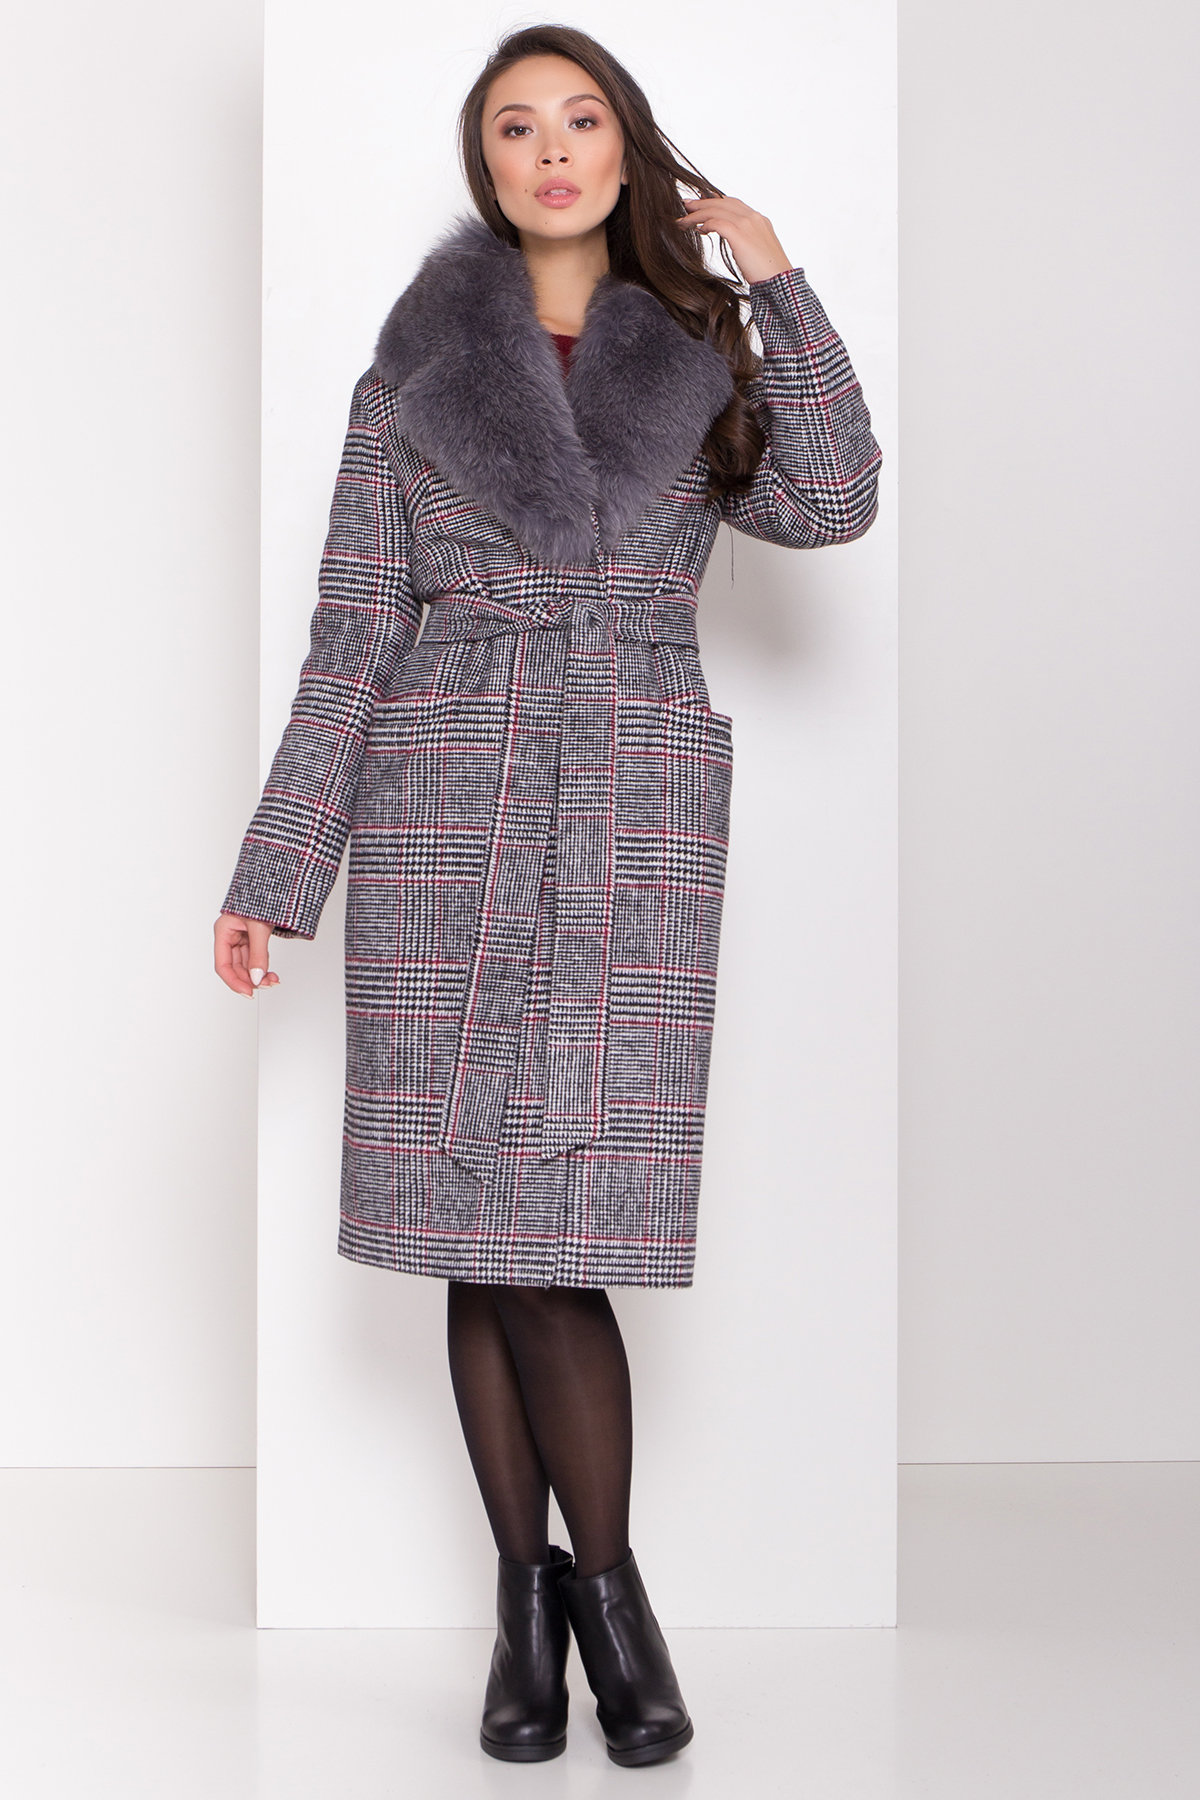 Пальто зима Вива 8279 АРТ. 44392 Цвет: Клетка кр черн/бел/кр - фото 1, интернет магазин tm-modus.ru